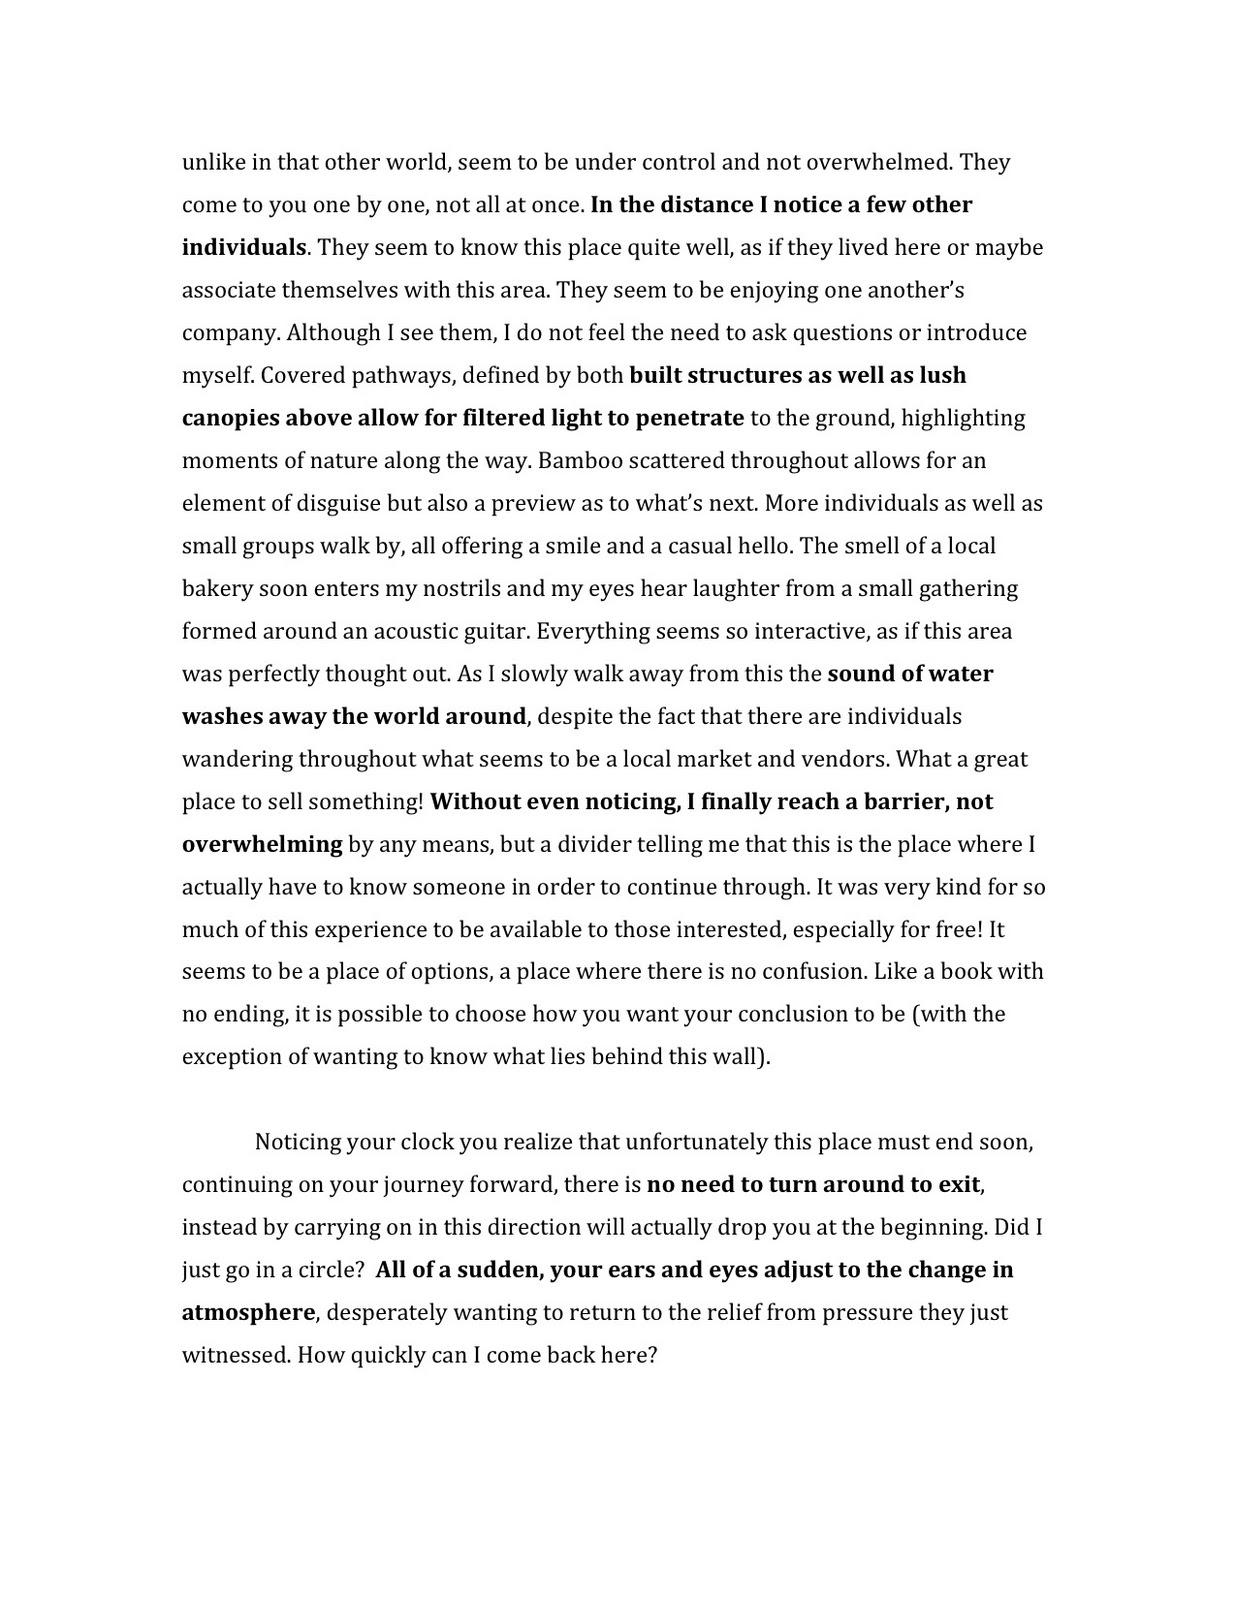 anzac legend essay the last anzacs fremantle press esl persuasive  anzac legend essay bean s anzac book shaped how ns think about essay au subject philosophy